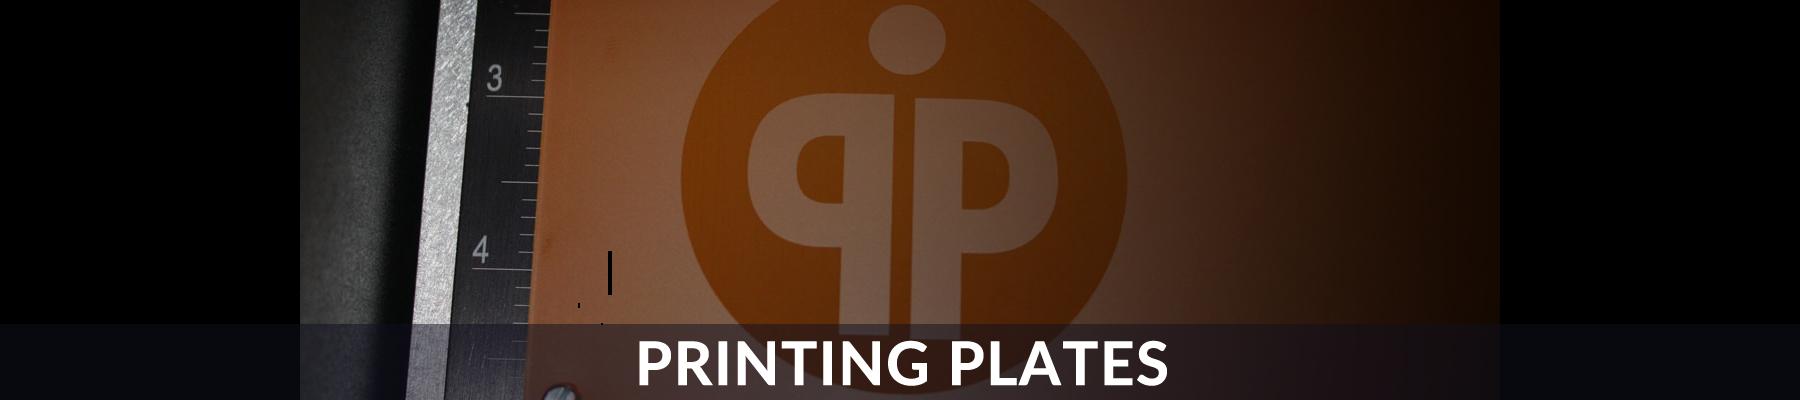 Printing Plates 2